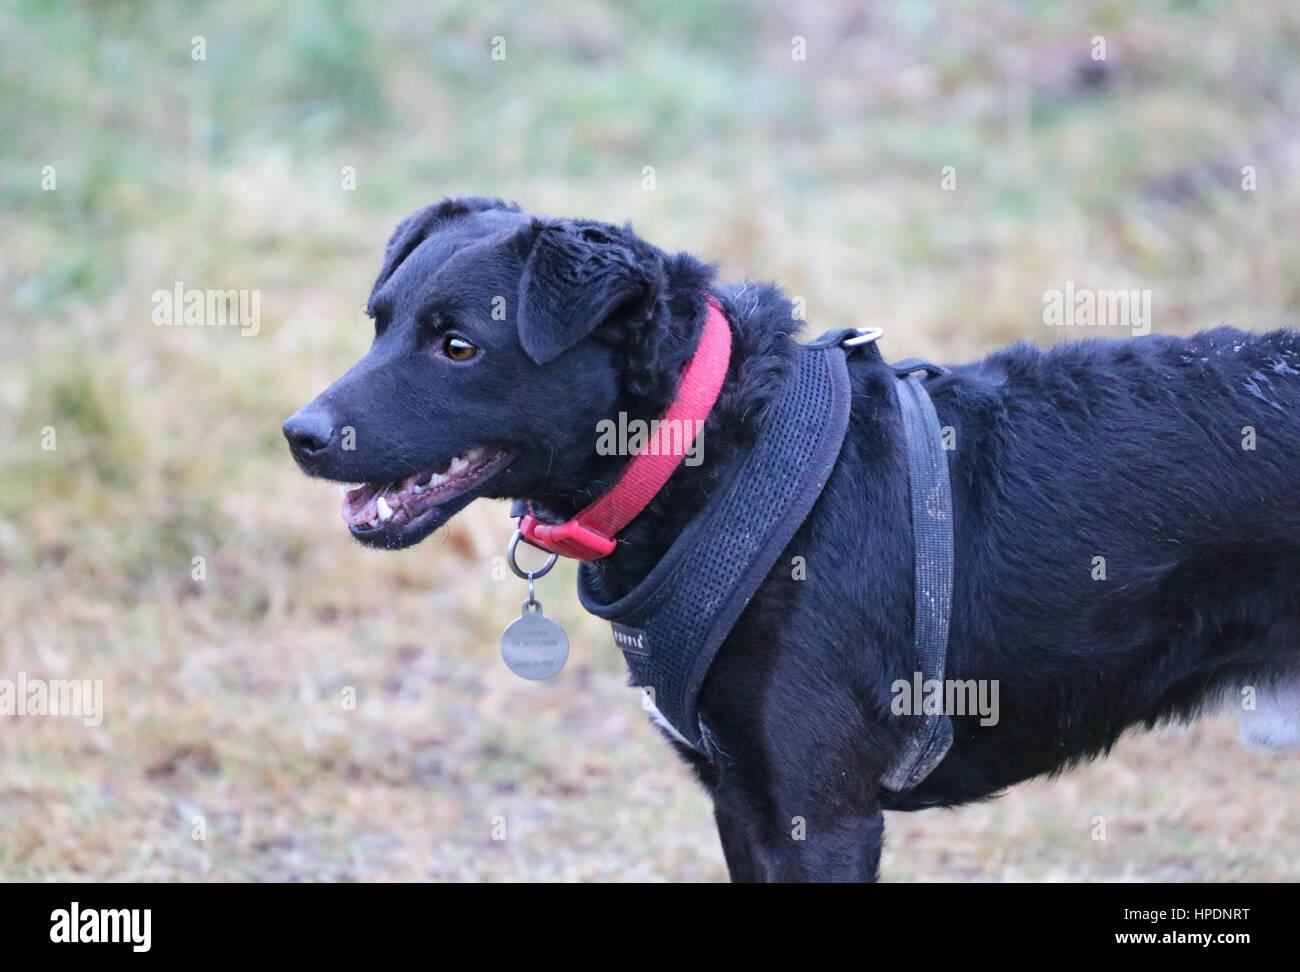 Patterdale Terrier wearing Harness on a walk Stock Photo